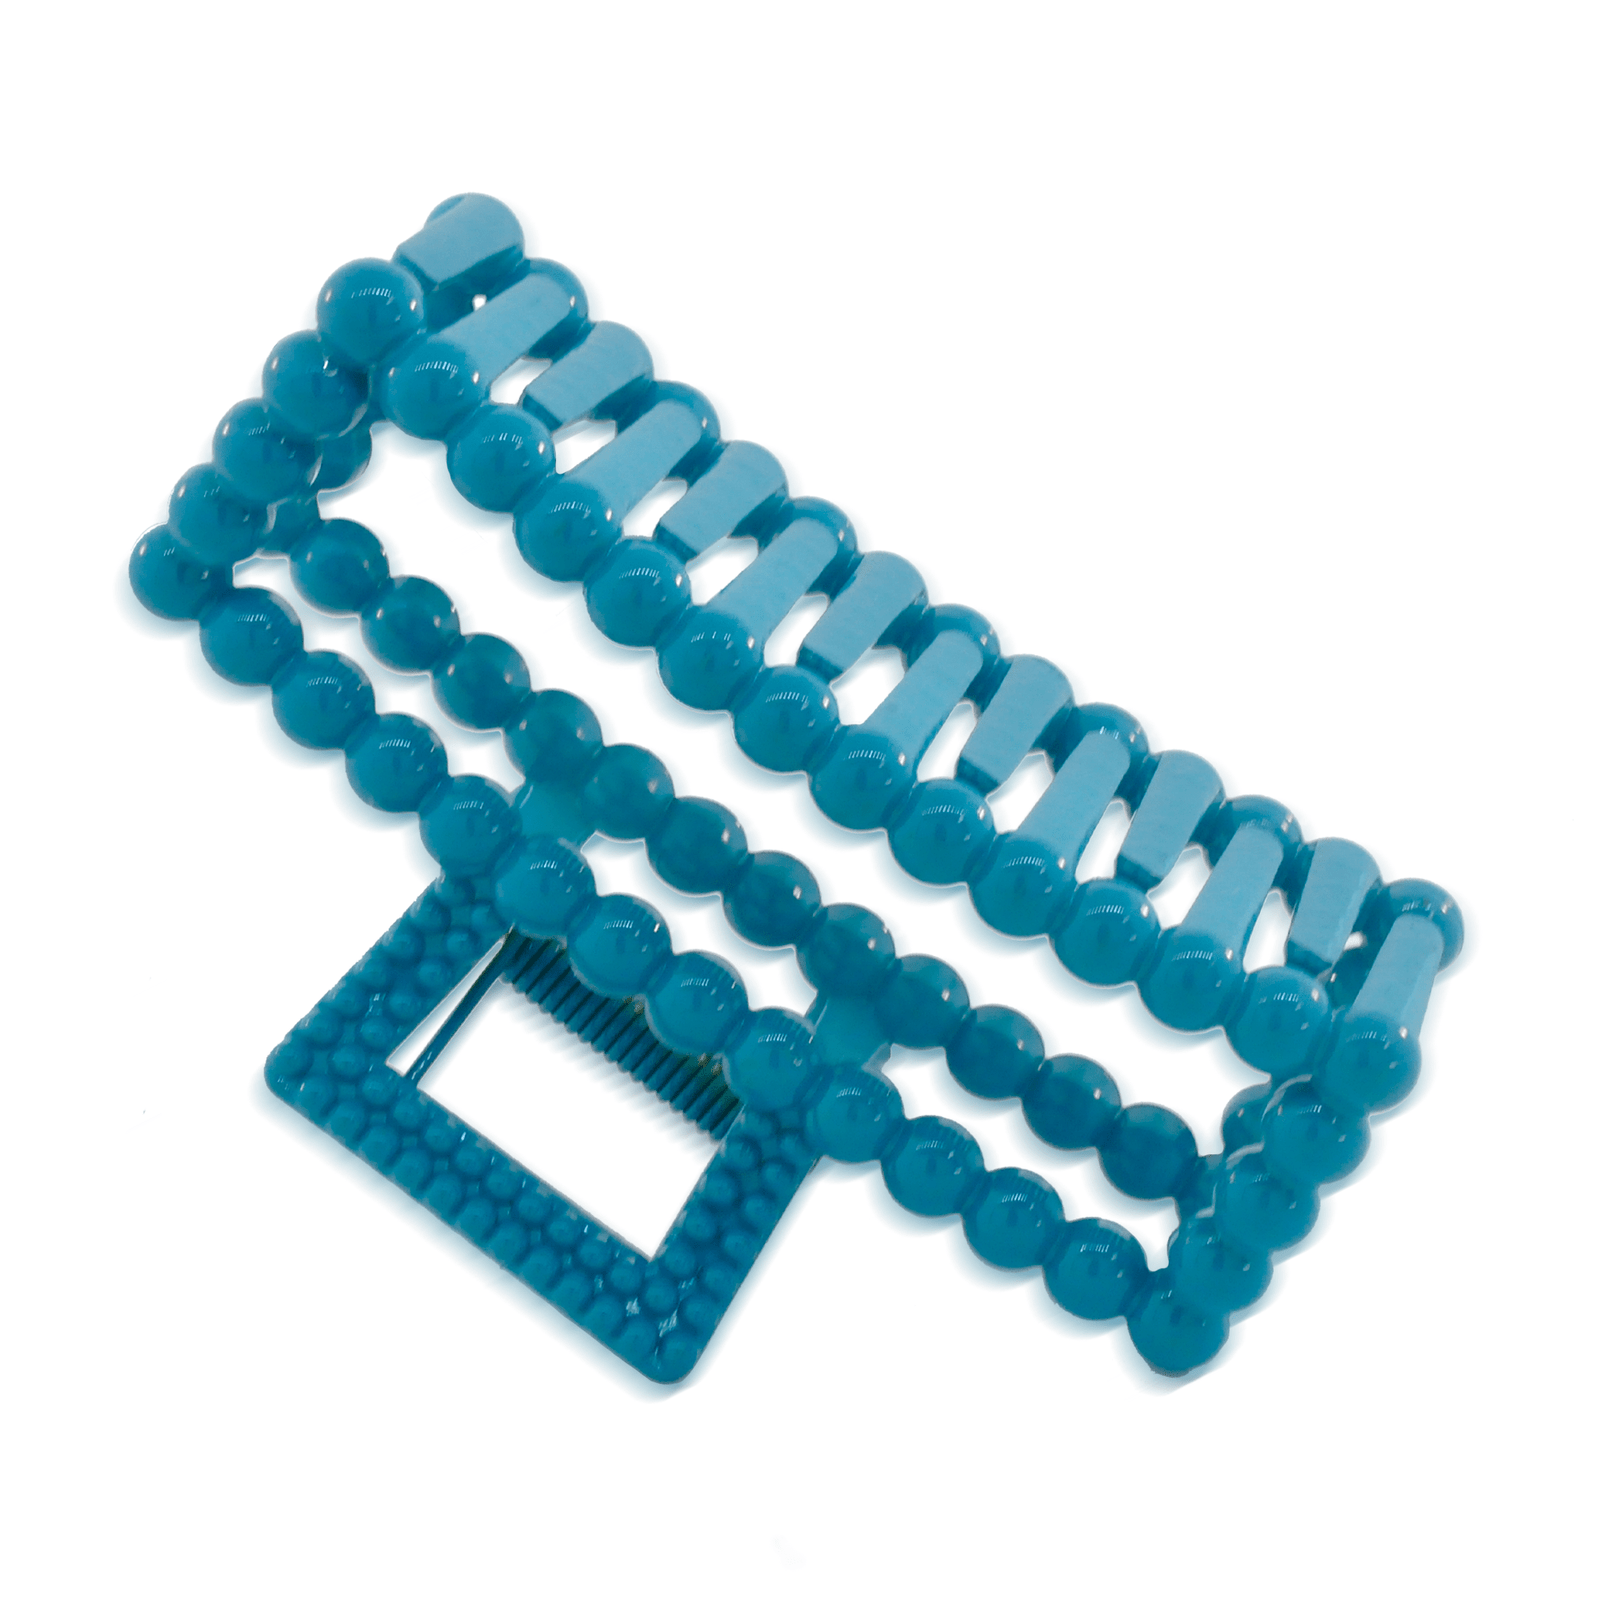 piranha esferas azul turquesa